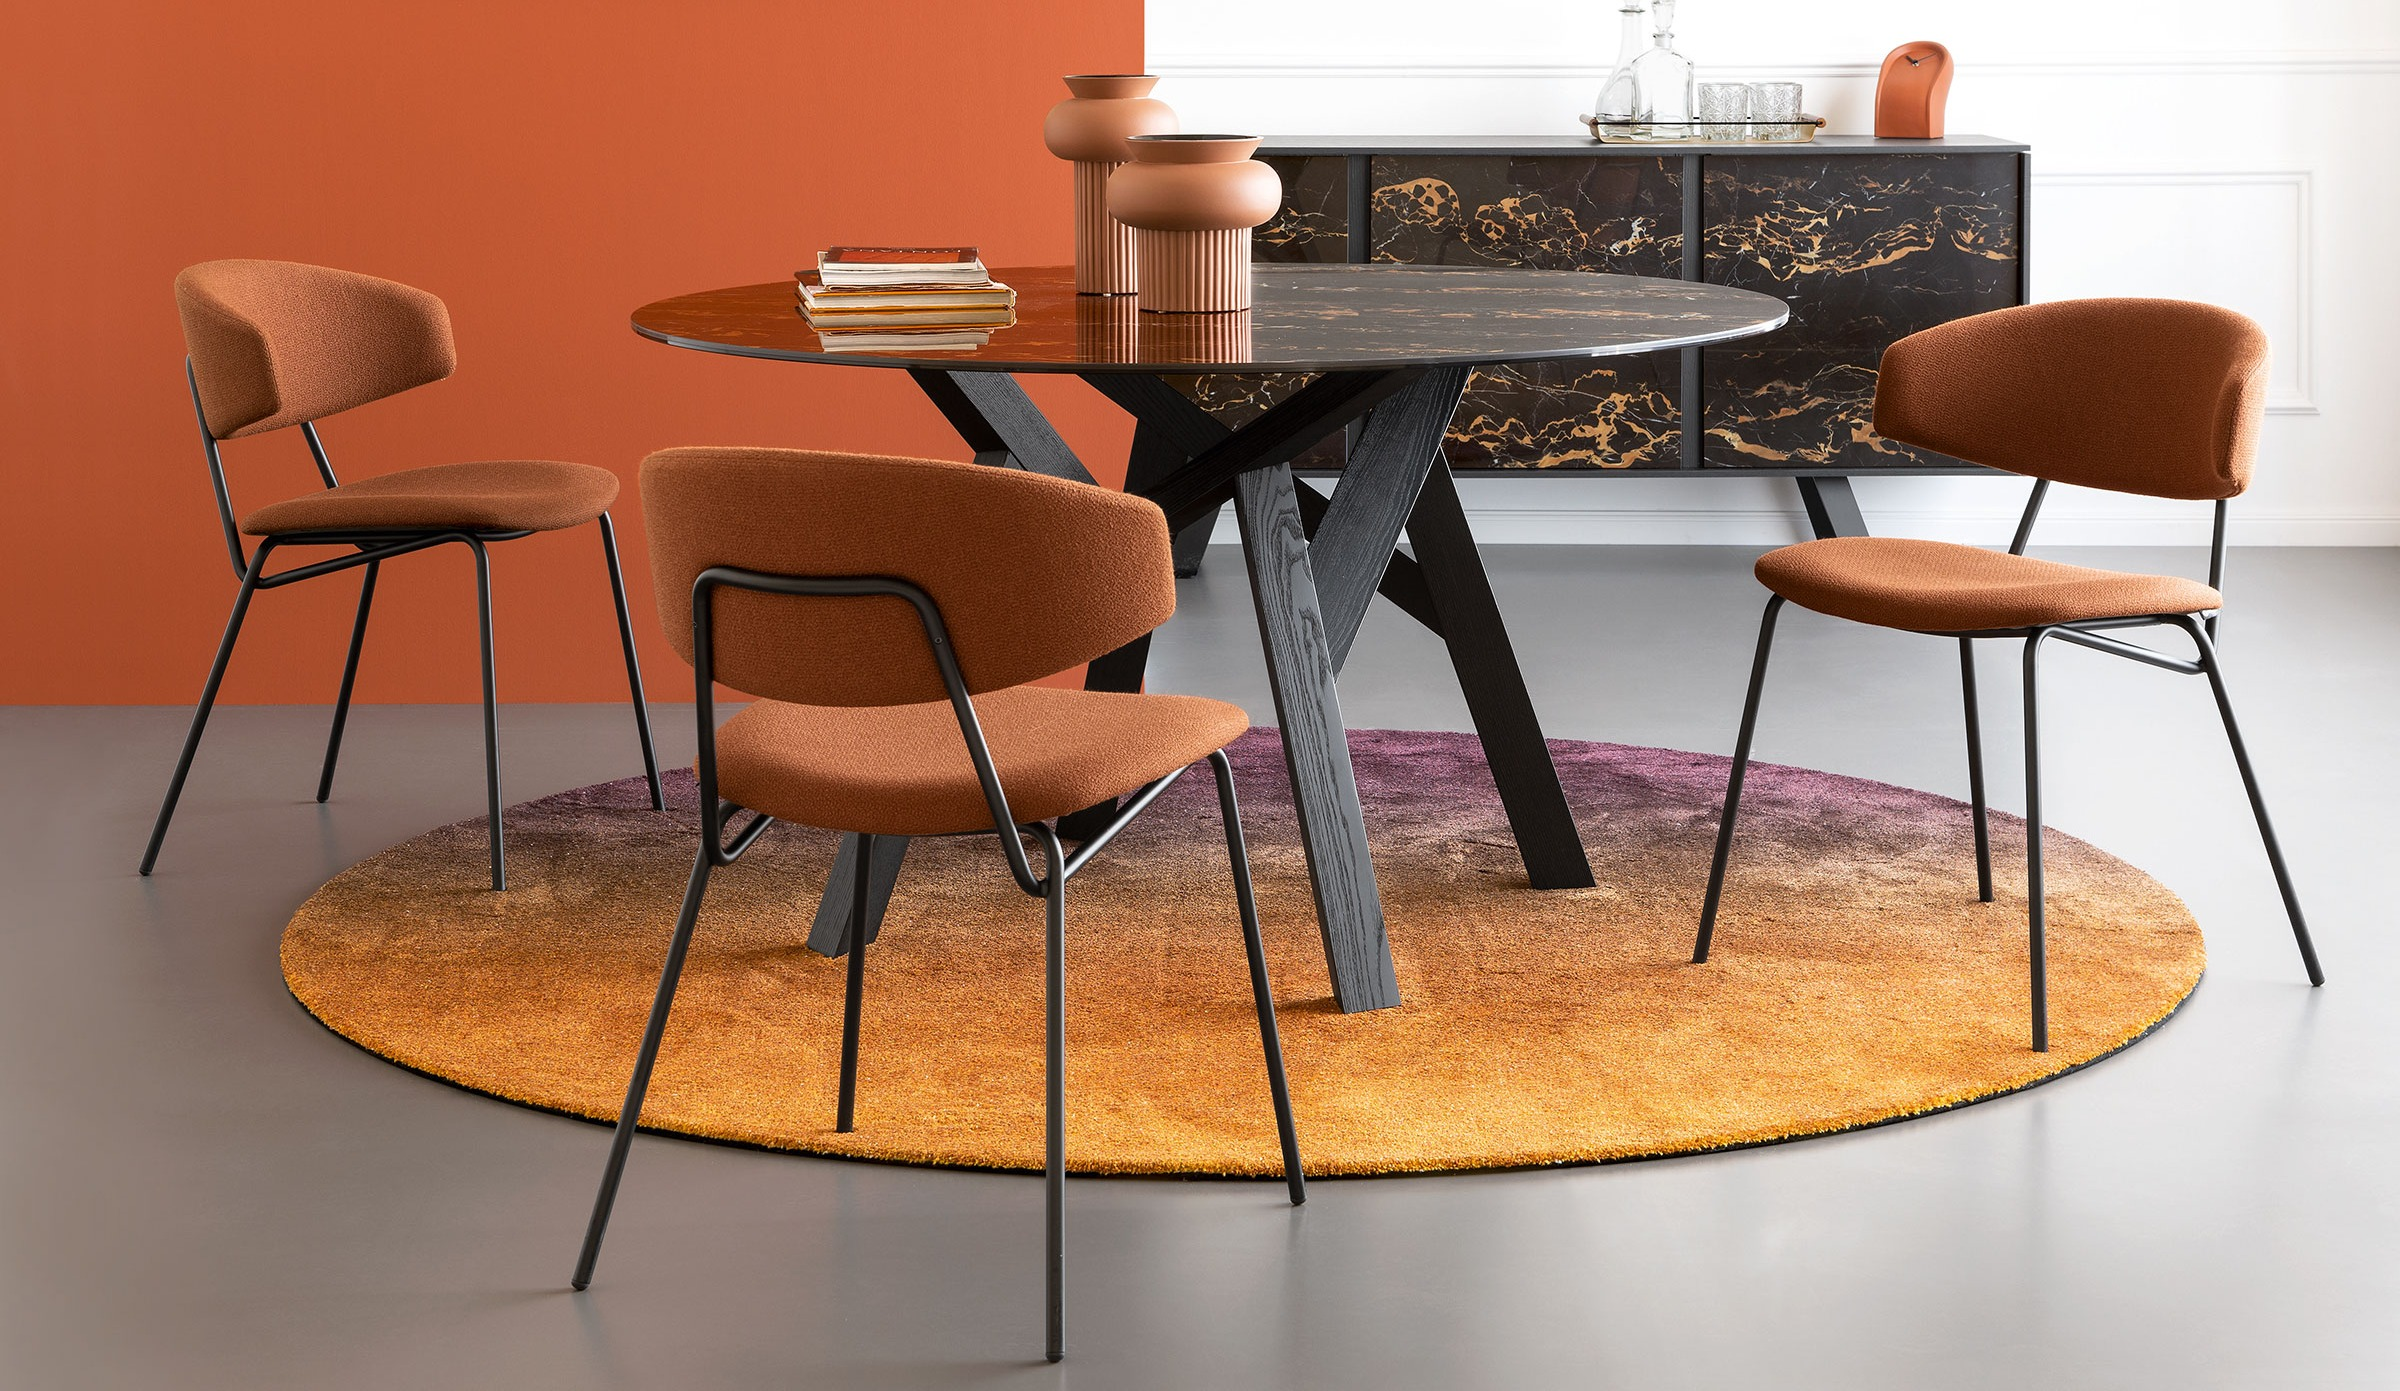 sophia dining chair in burnt orange upholstery